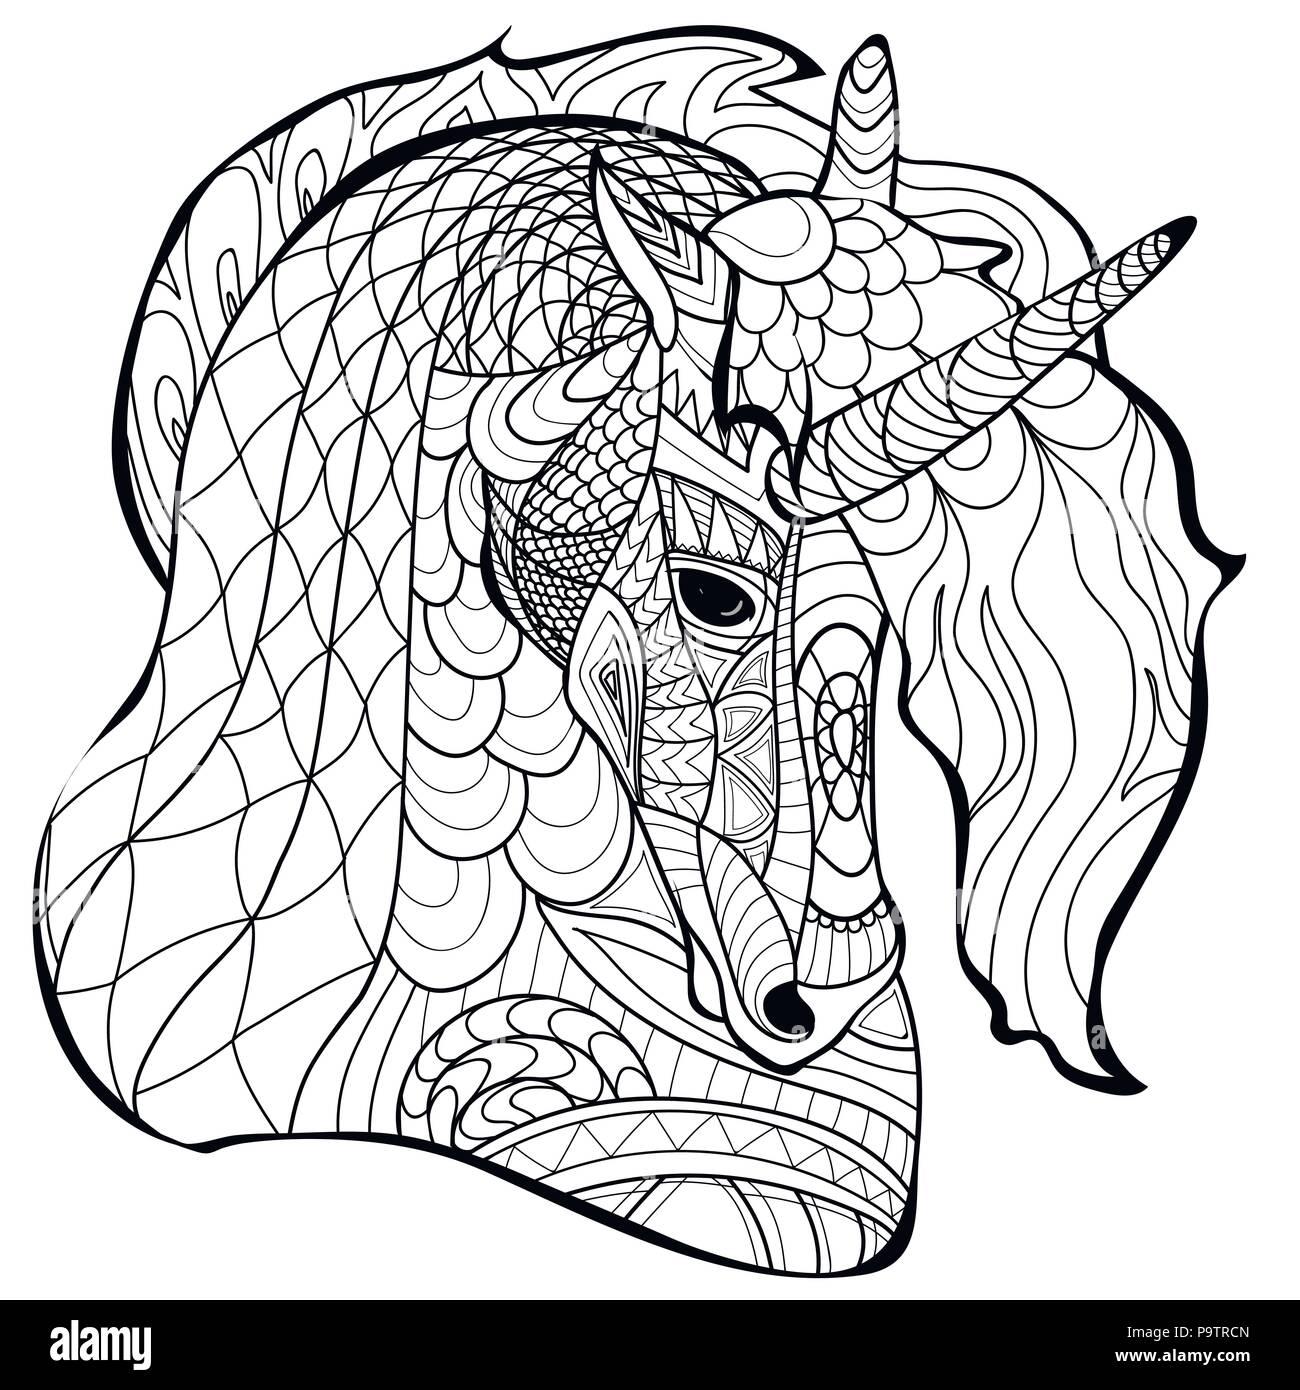 Ligne Unicorn Coloriage Coloring Book Vector Motif